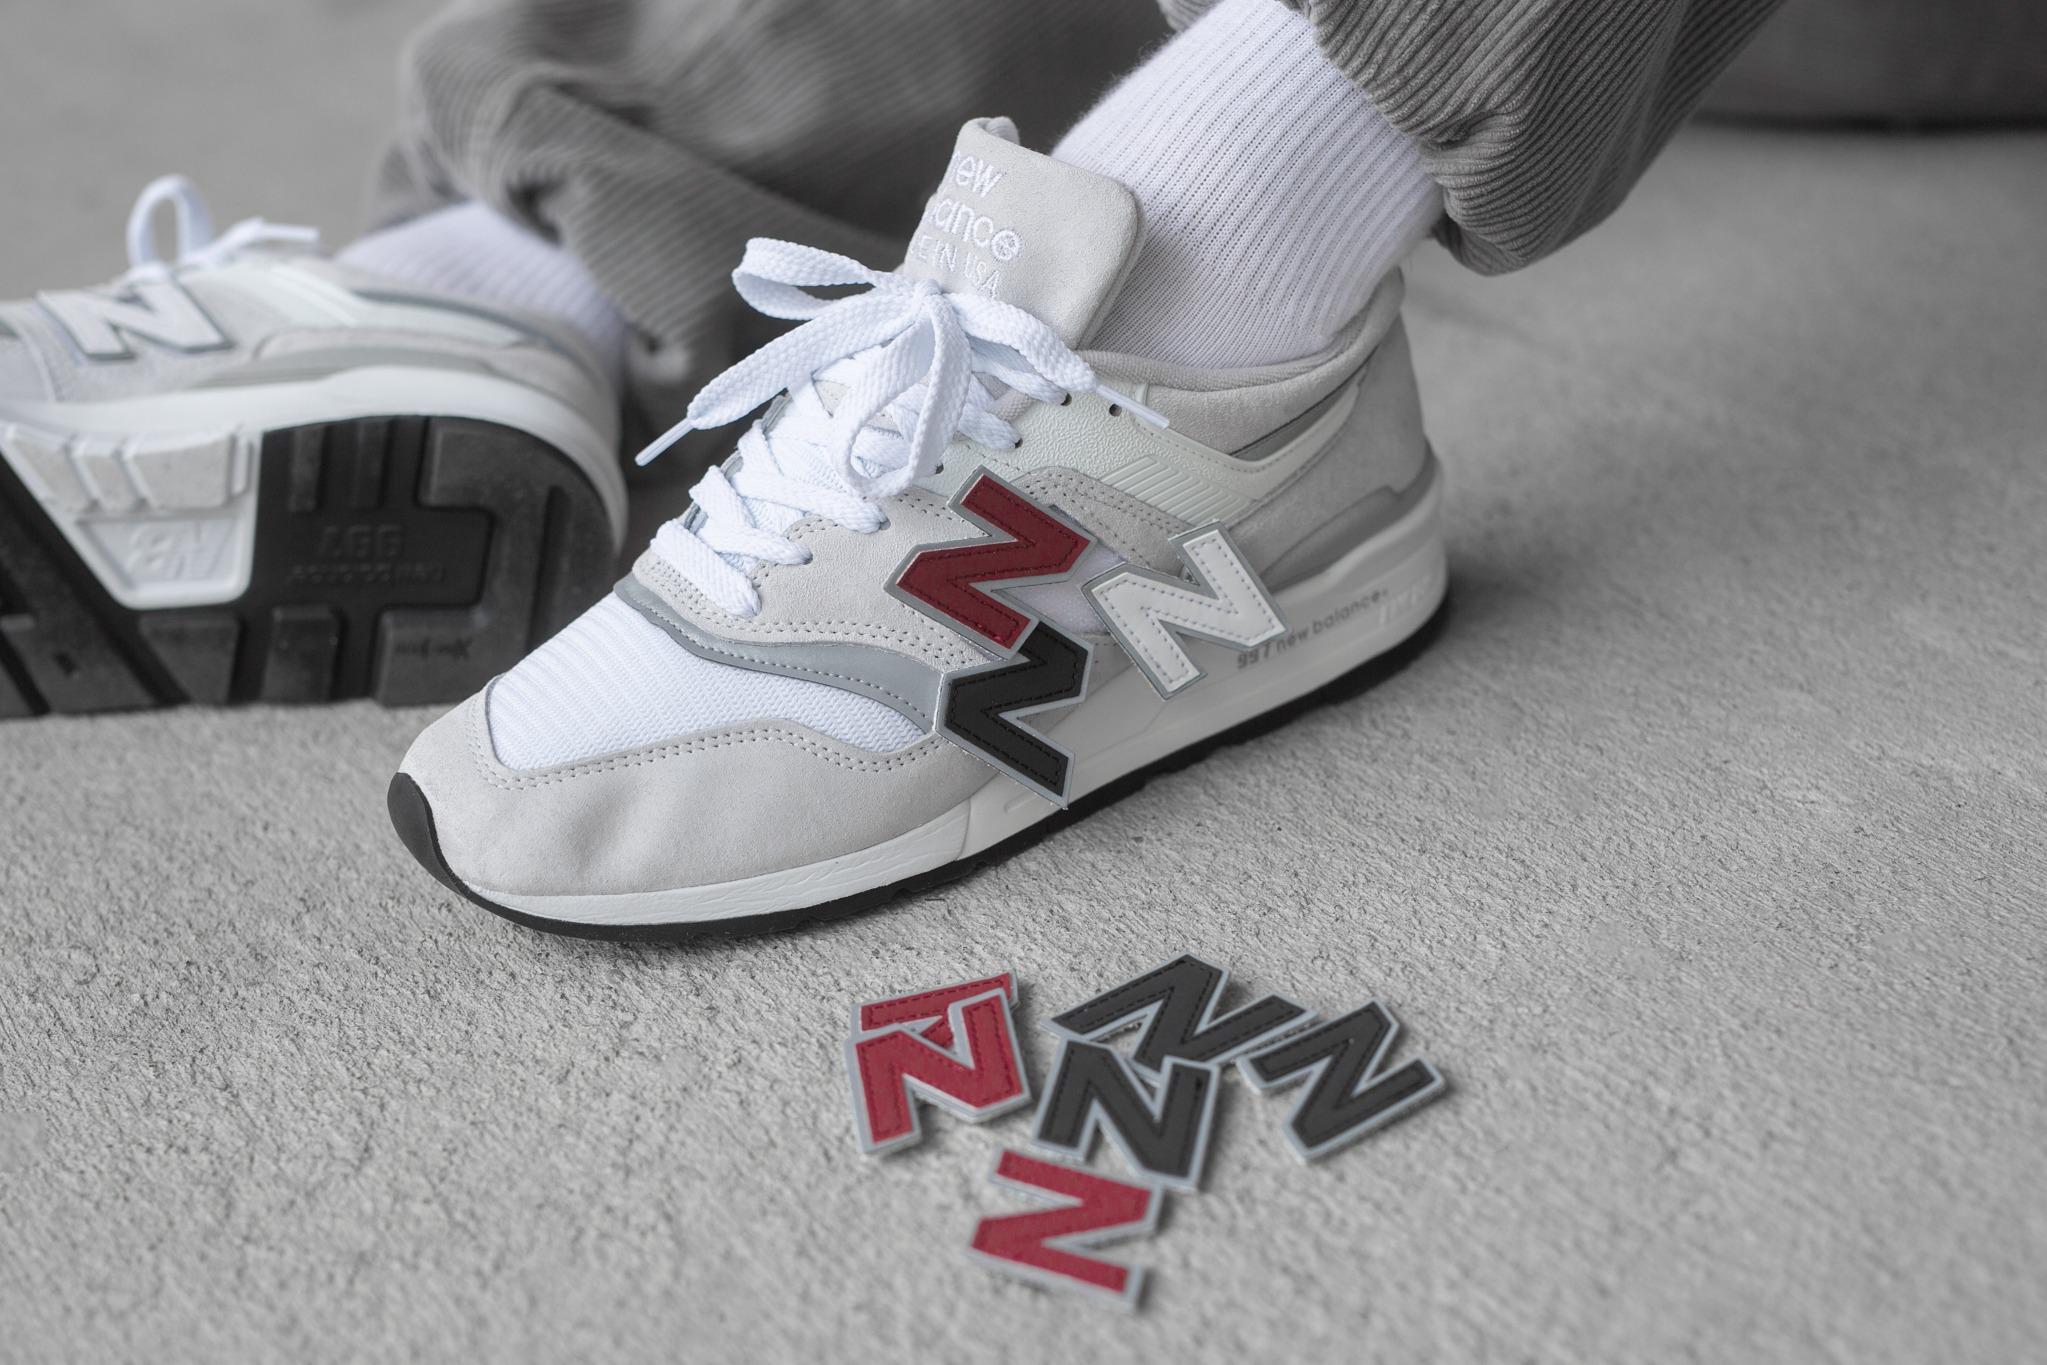 New Balance 997 Drops with Interchangeable N - EUKICKS